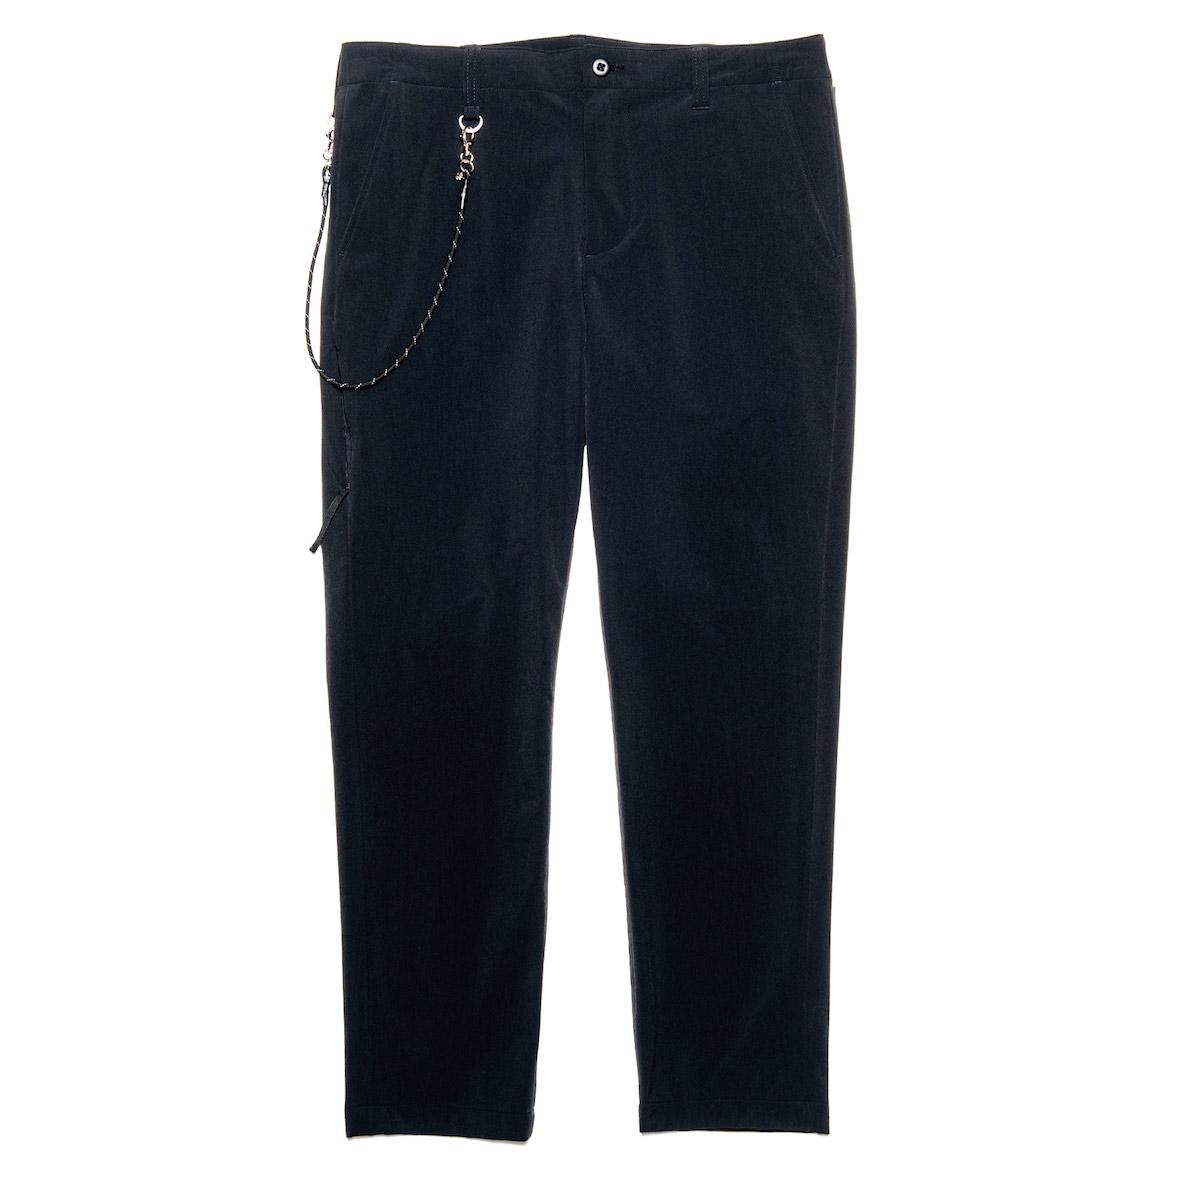 uniform experiment / STRETCH POPLIN SIDE POCKET TAPERED PANTS (Black)